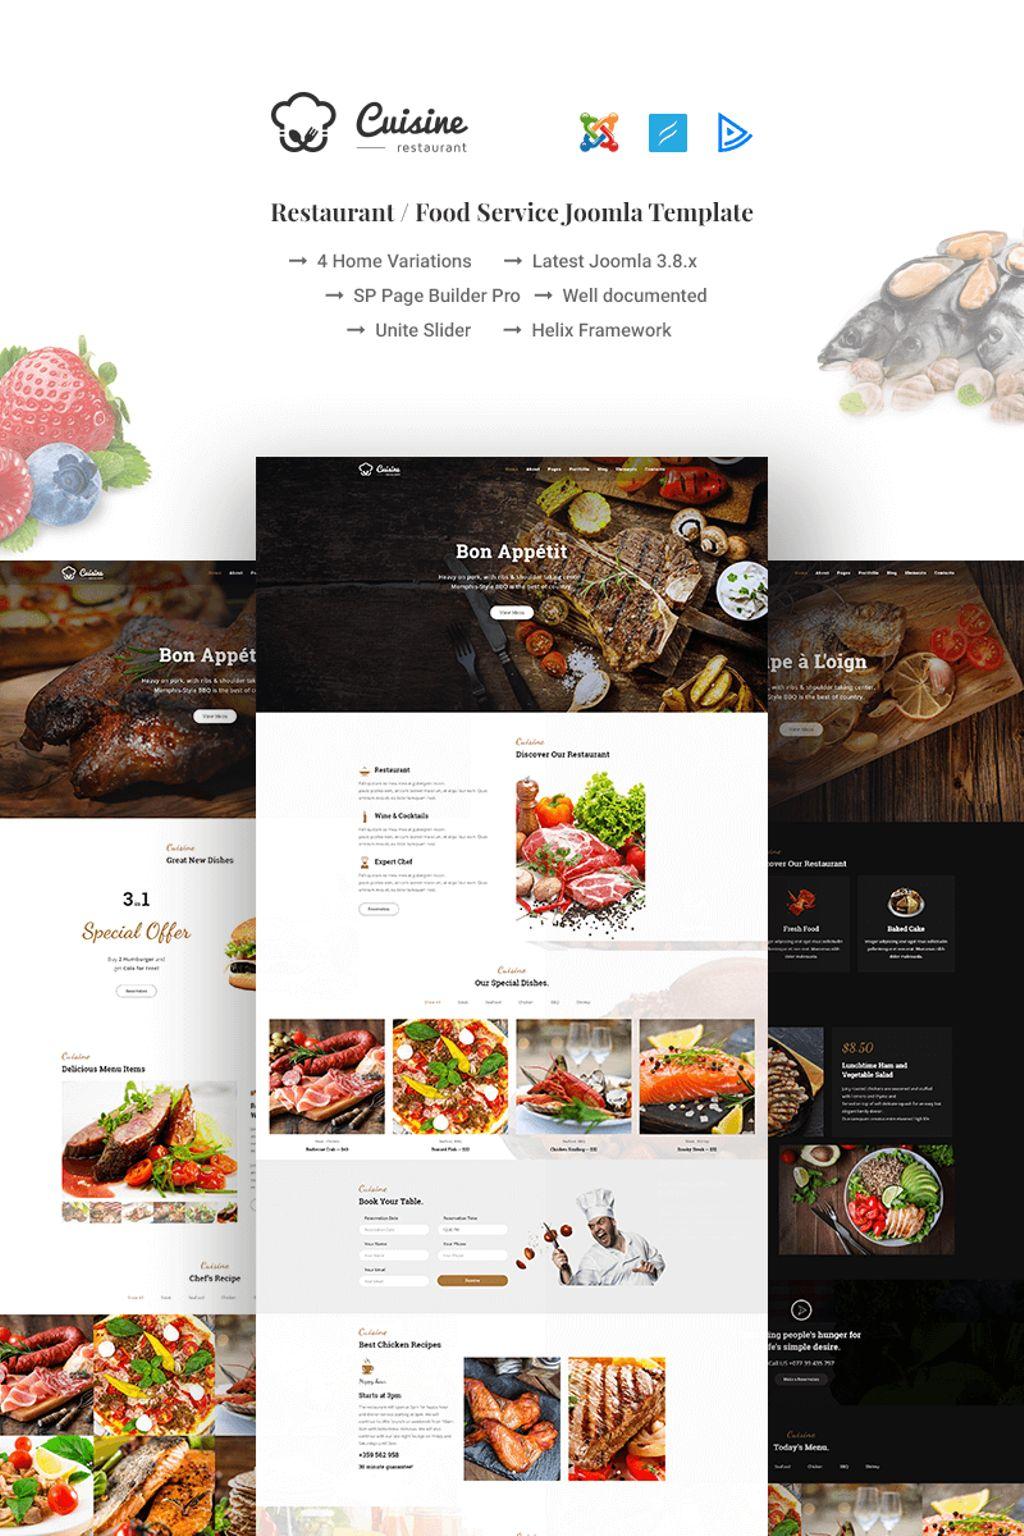 Cuisine - Restaurant / Food Service №66965 - скриншот